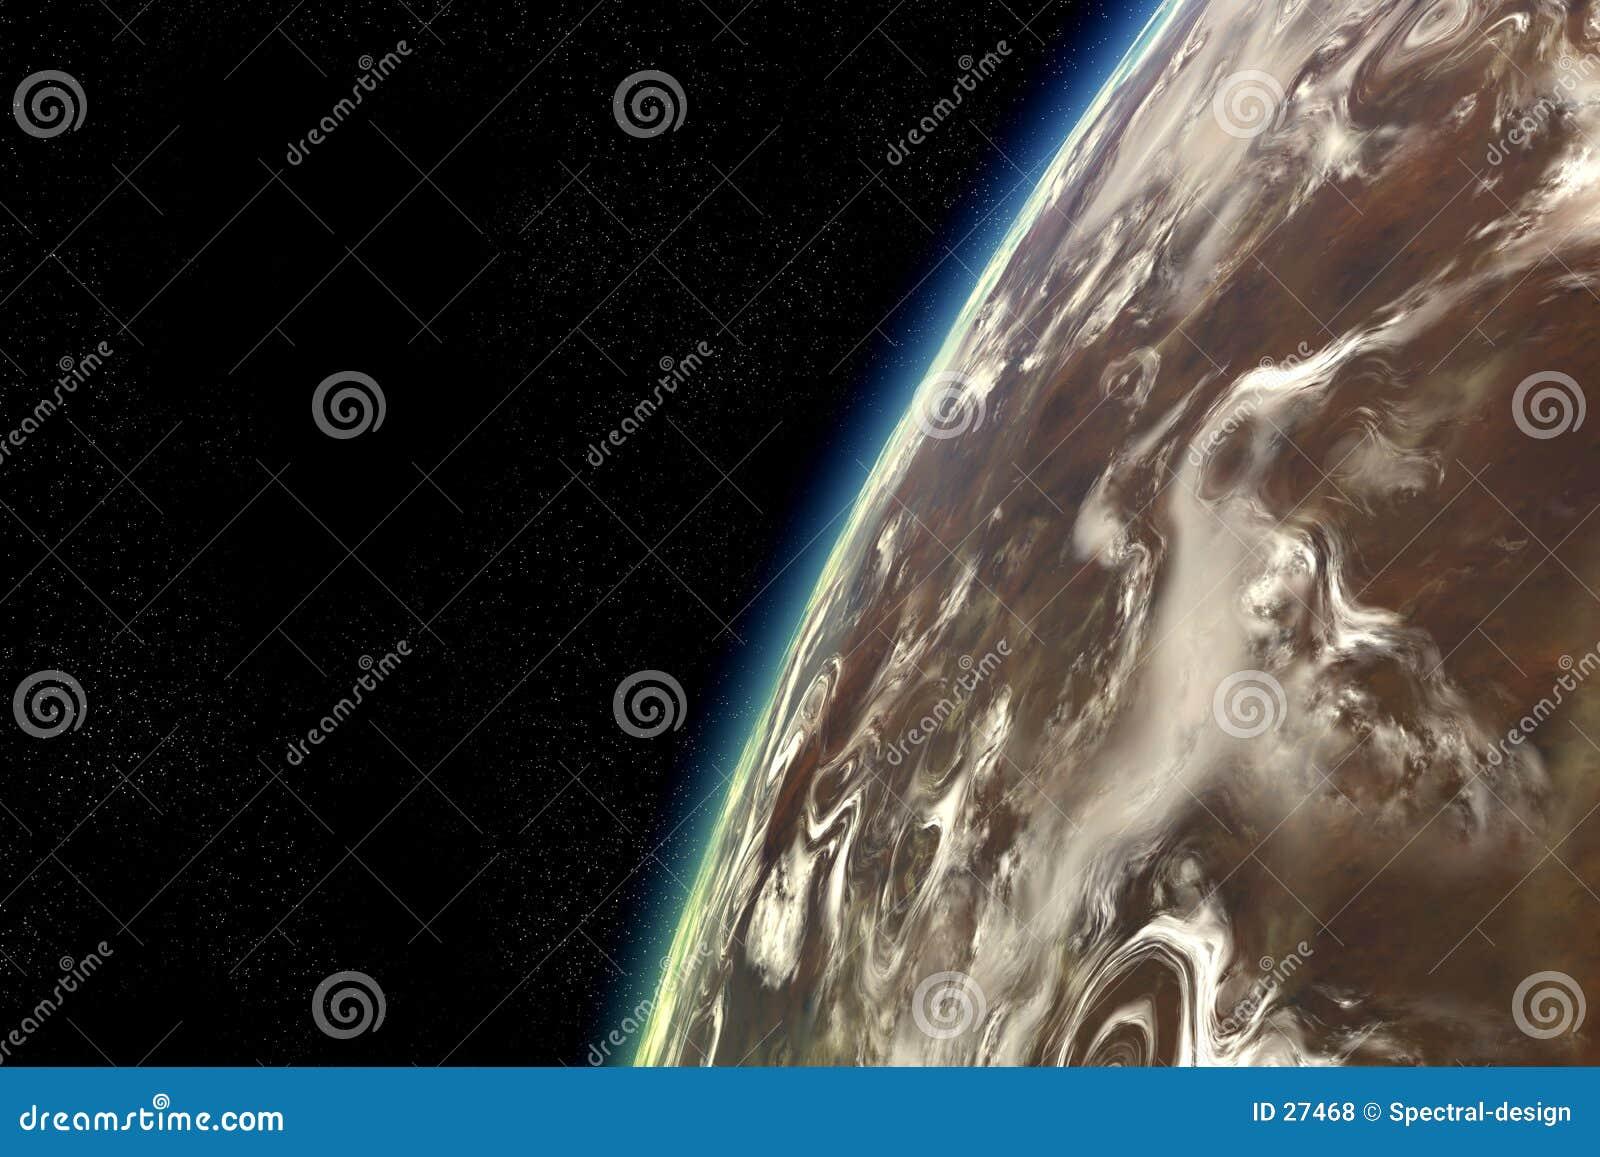 Alien Planet Orbit